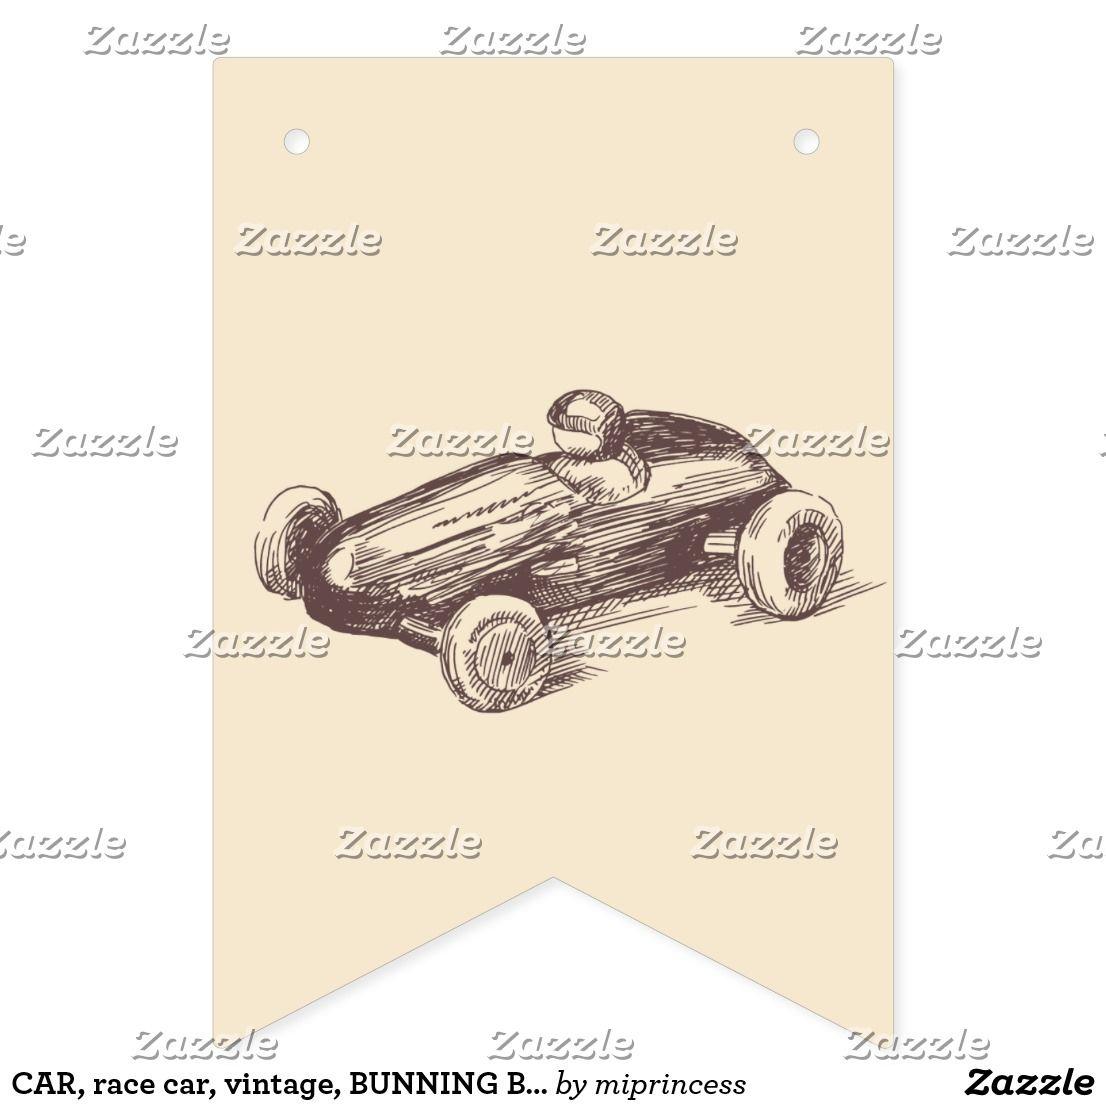 CAR, Race Car, Vintage, BUNNING BANNER